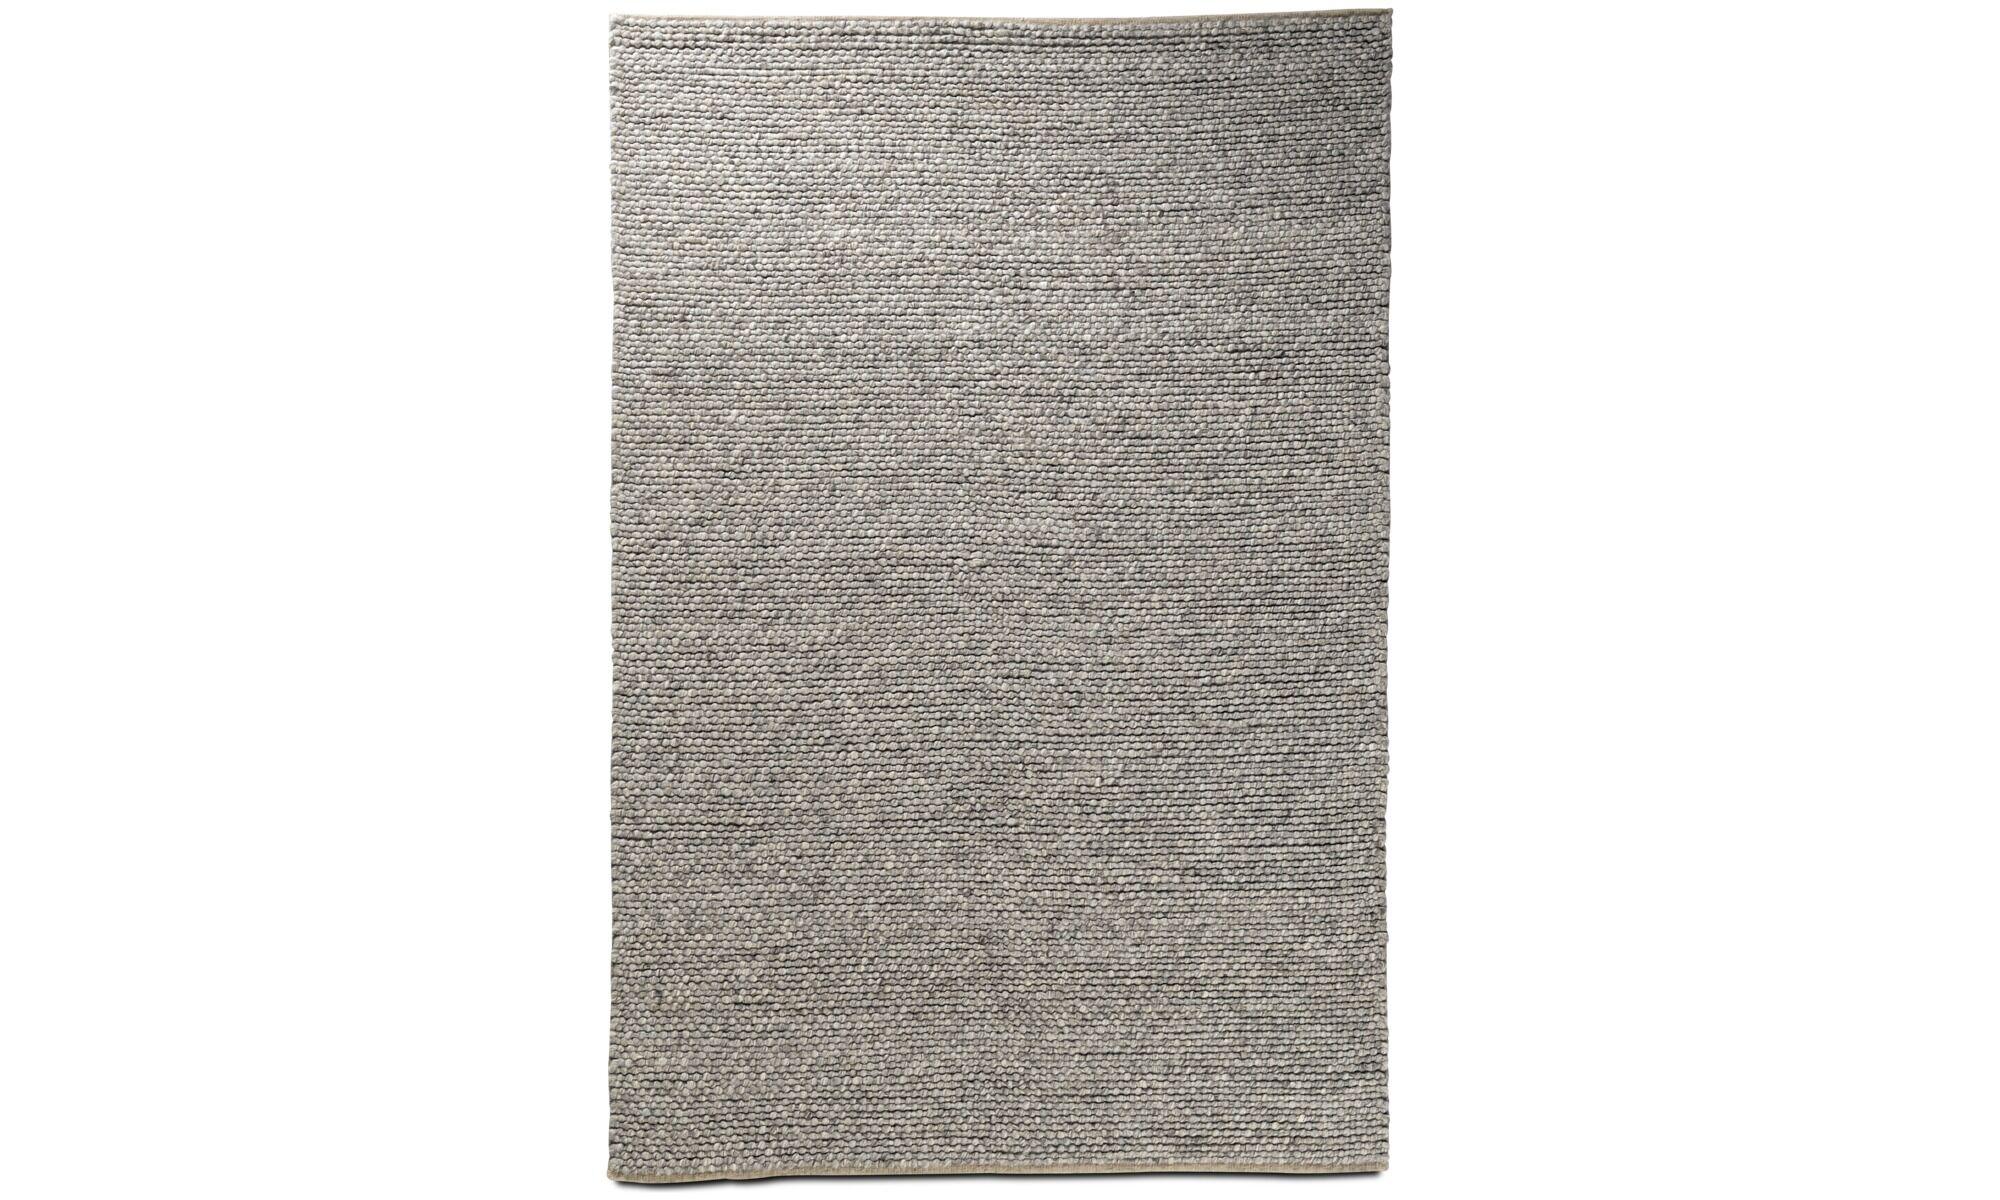 Northern rug